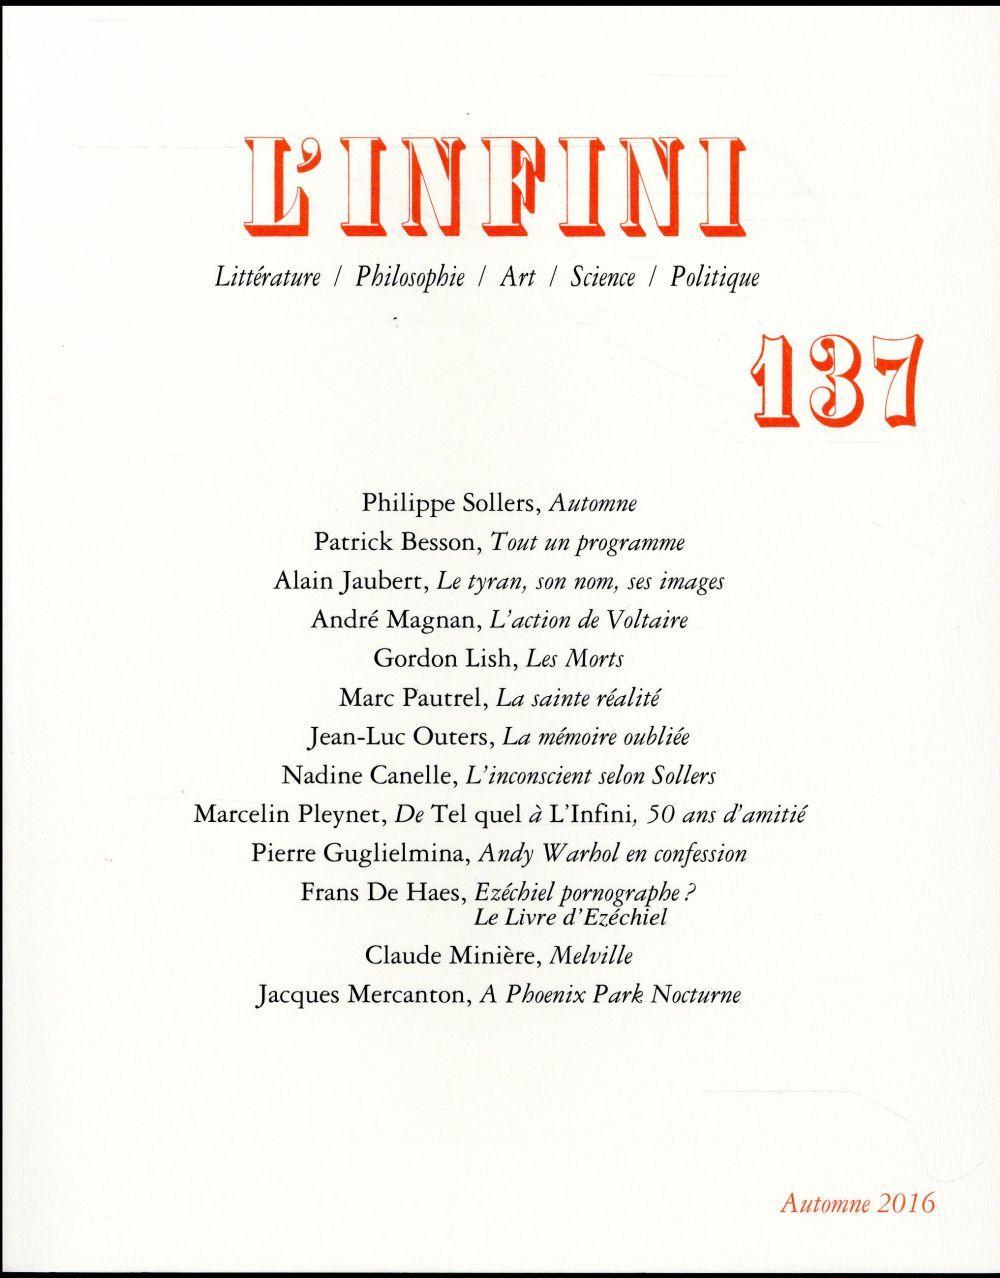 Collectifs Gallimard Collectif Gallimard Livre France Loisirs